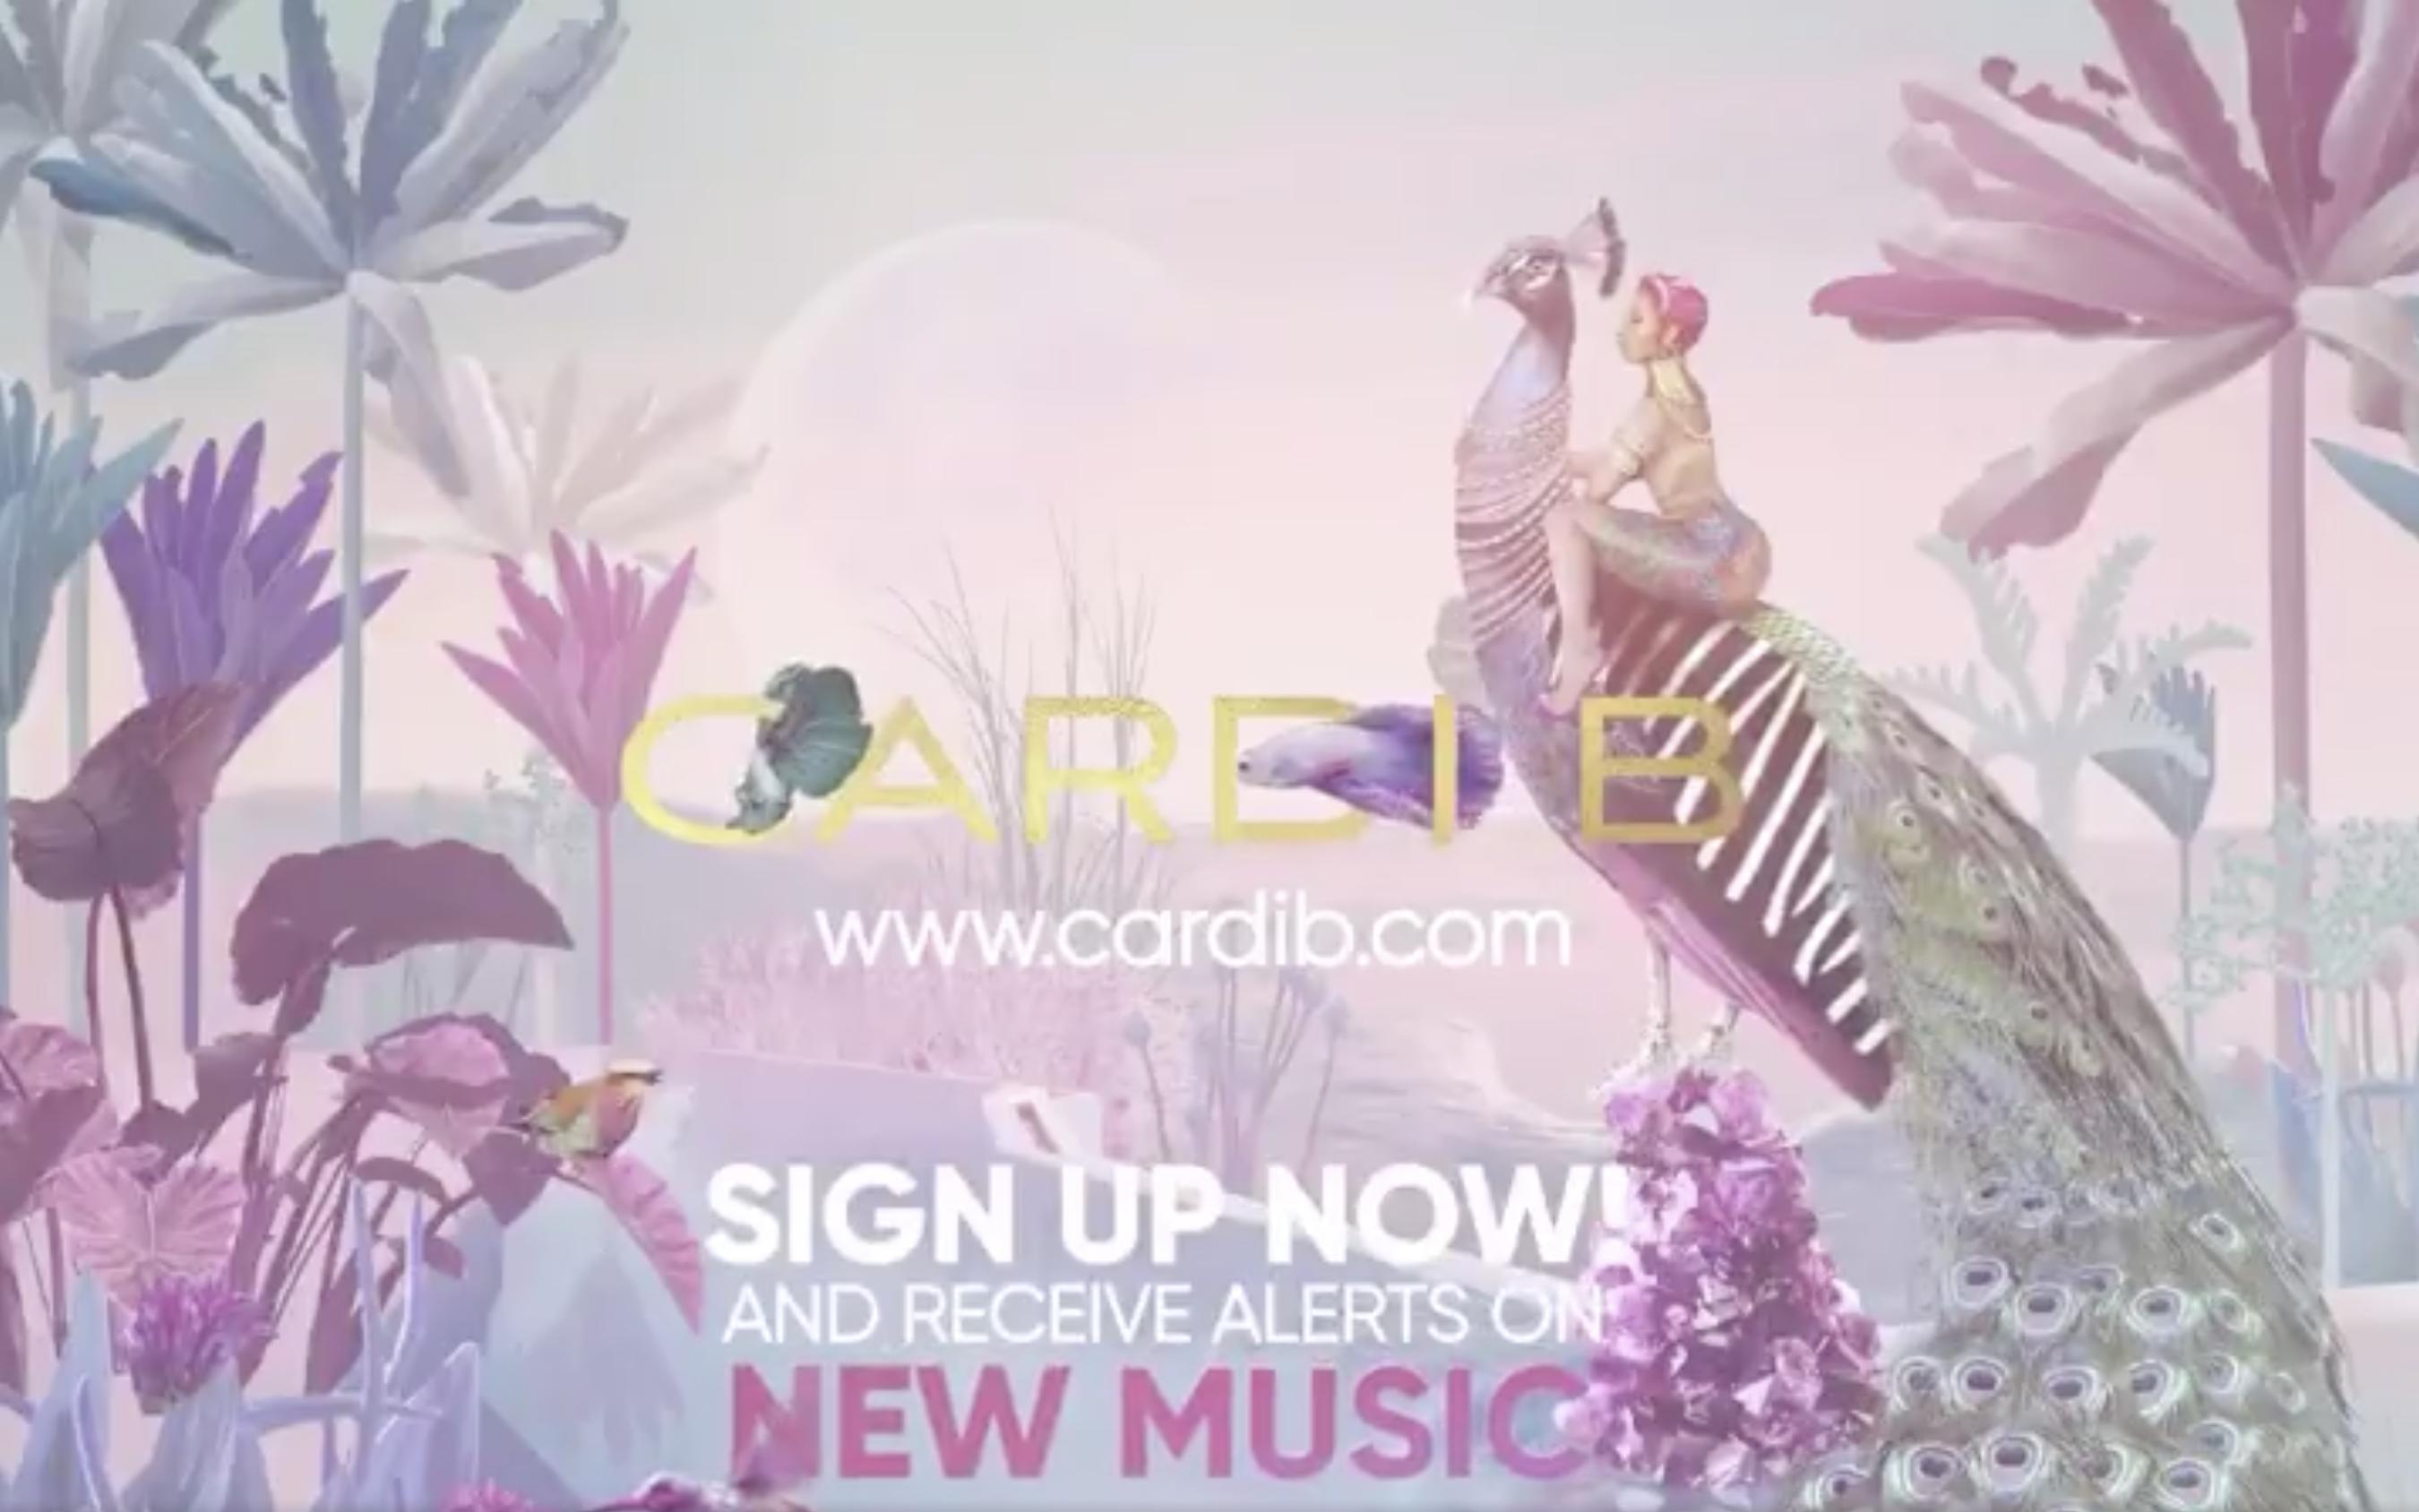 Cardi B new music